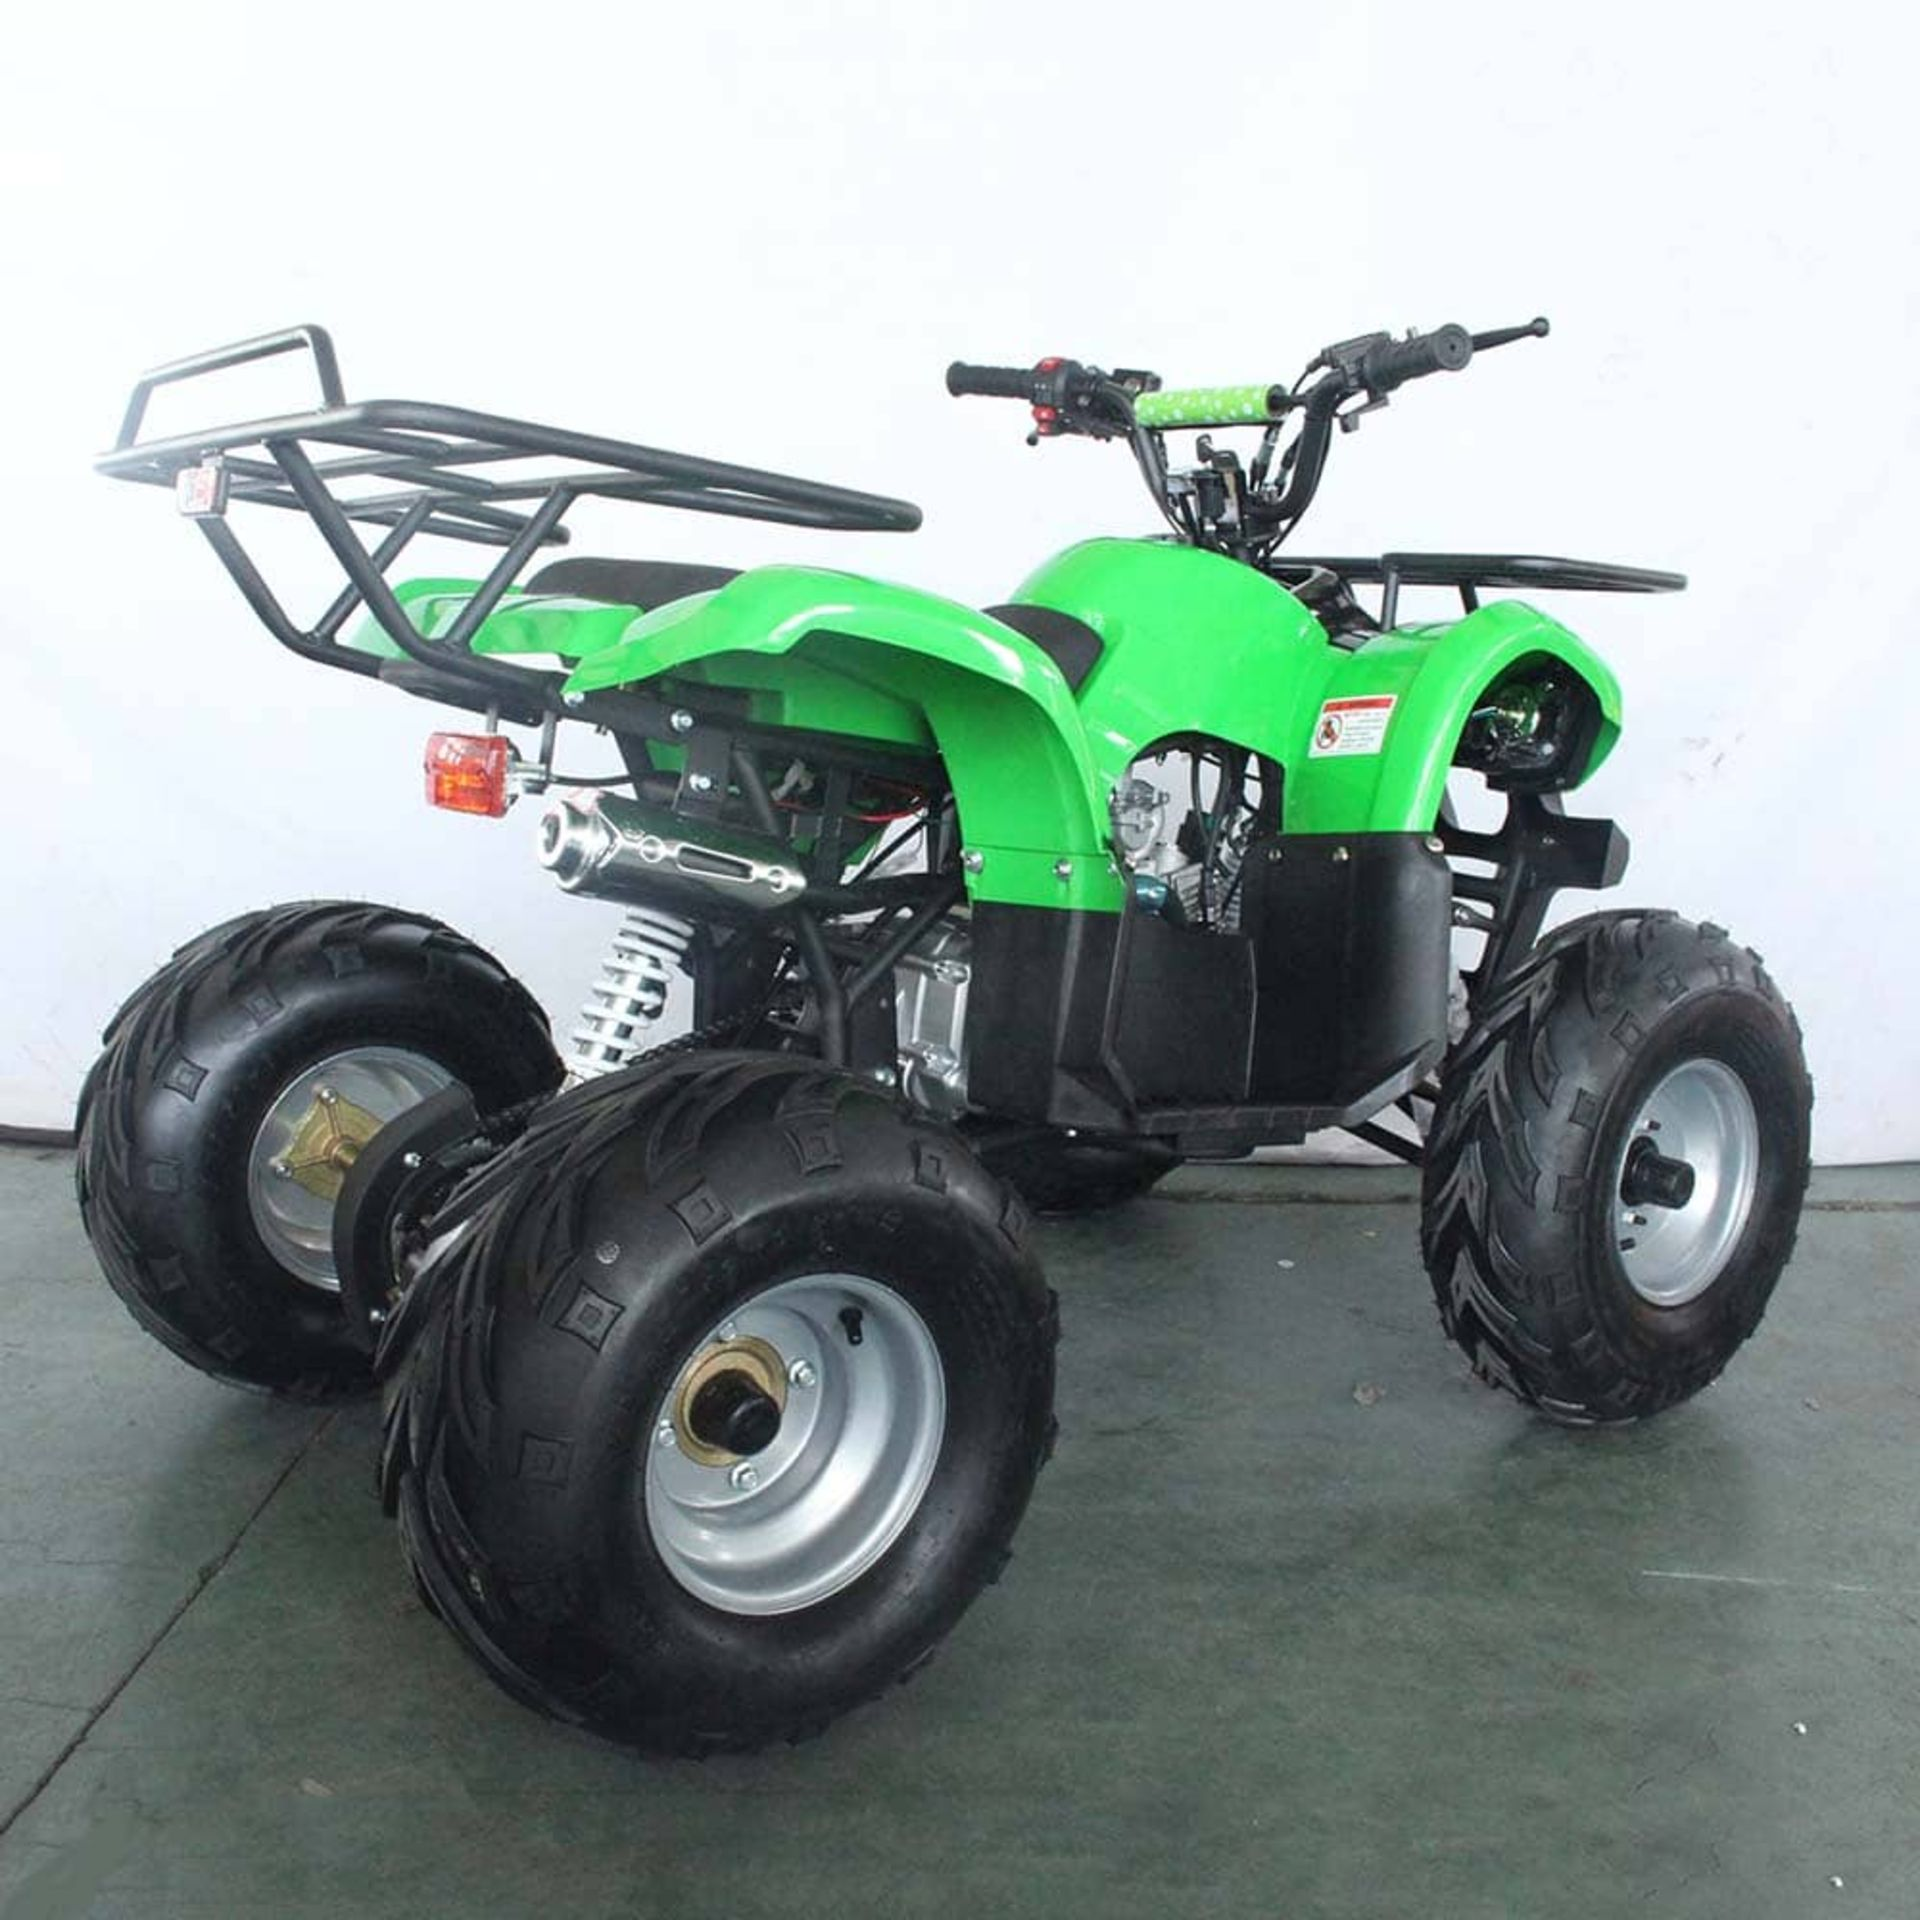 + VAT Brand New 125cc Condor Quad Bike - Four Stroke - Single Cylinder - Front Drum Brakes & Rear - Image 5 of 9